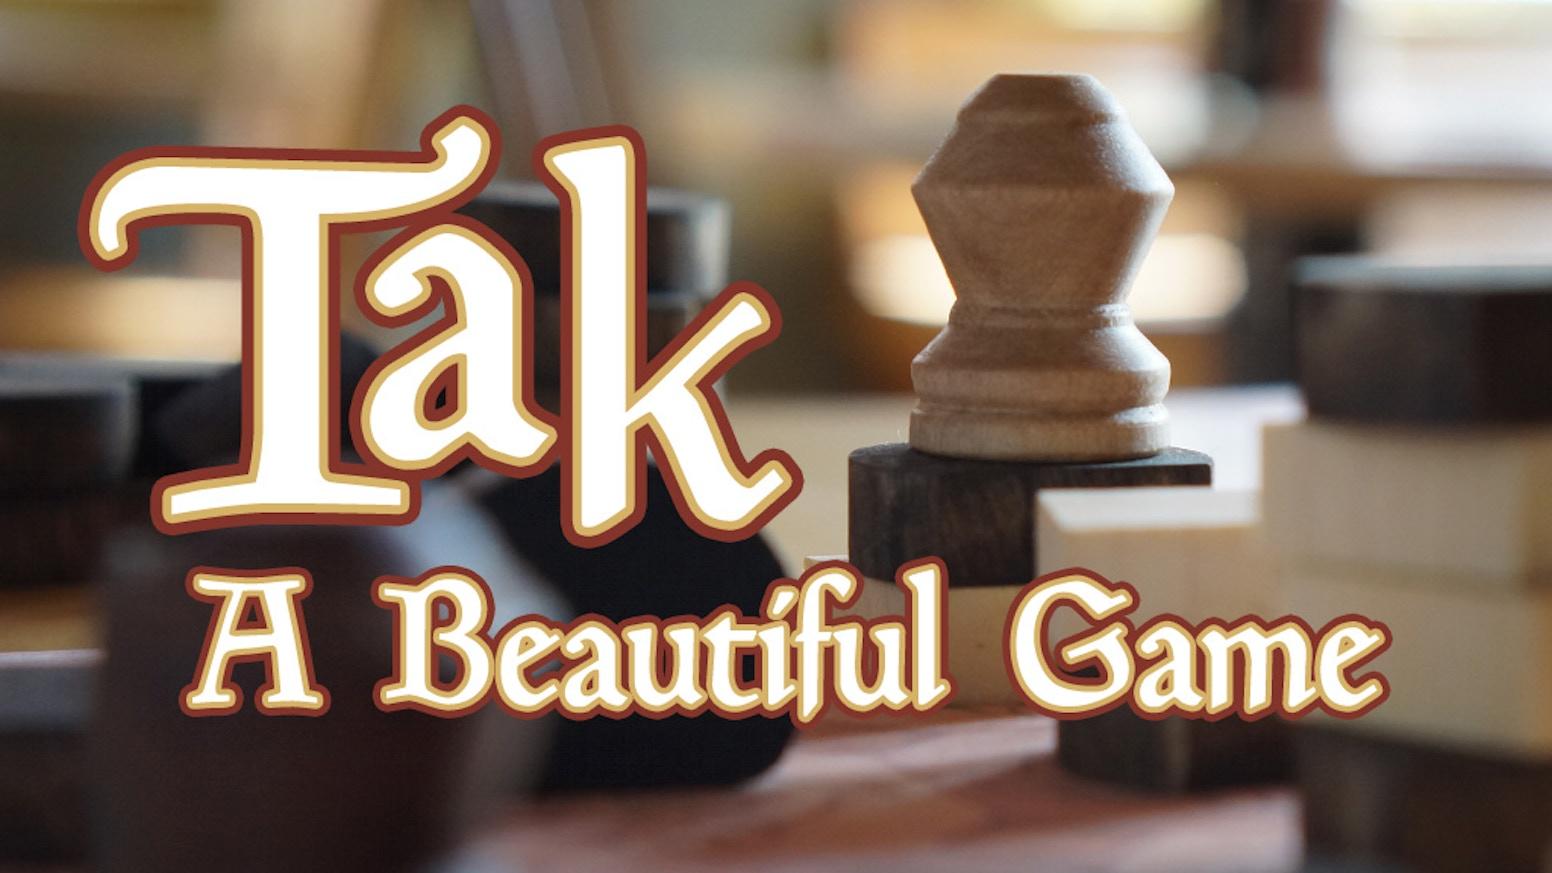 Tak: A Beautiful Game by Cheapass Games — Kickstarter